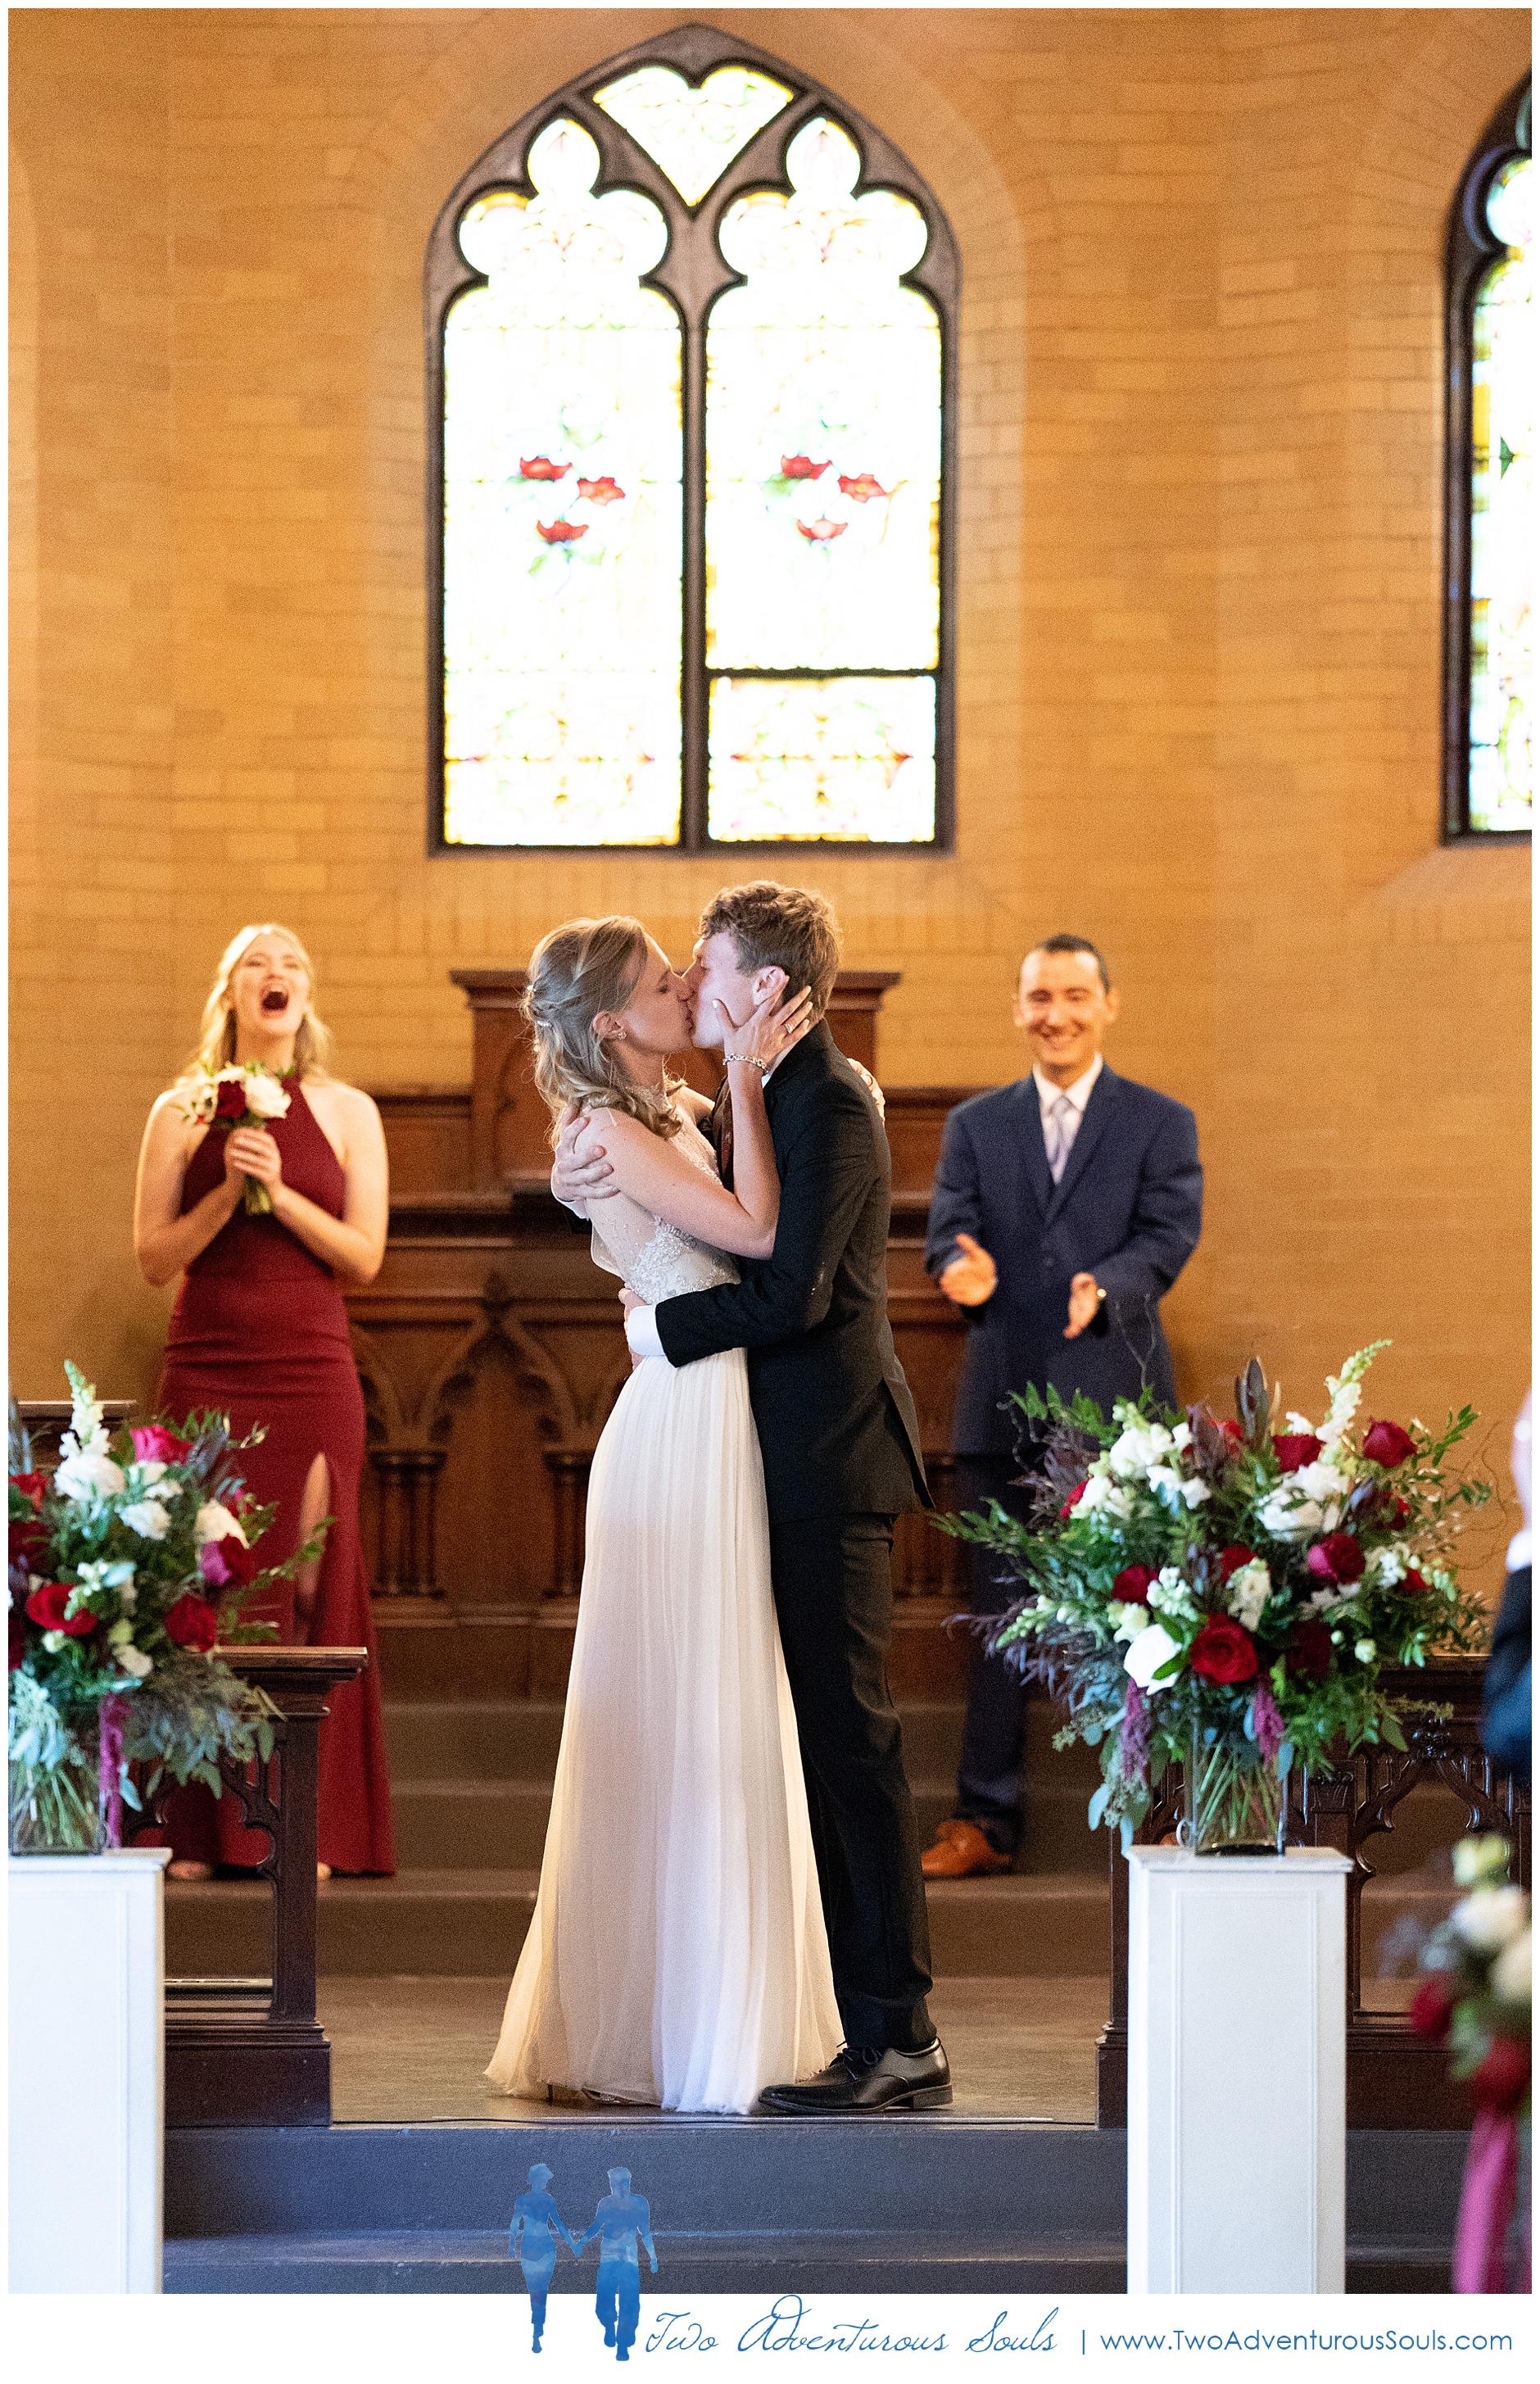 Grace Maine Photographers, Portland Maine Wedding Photographers, Two Adventurous Souls- 090719_0024.jpg